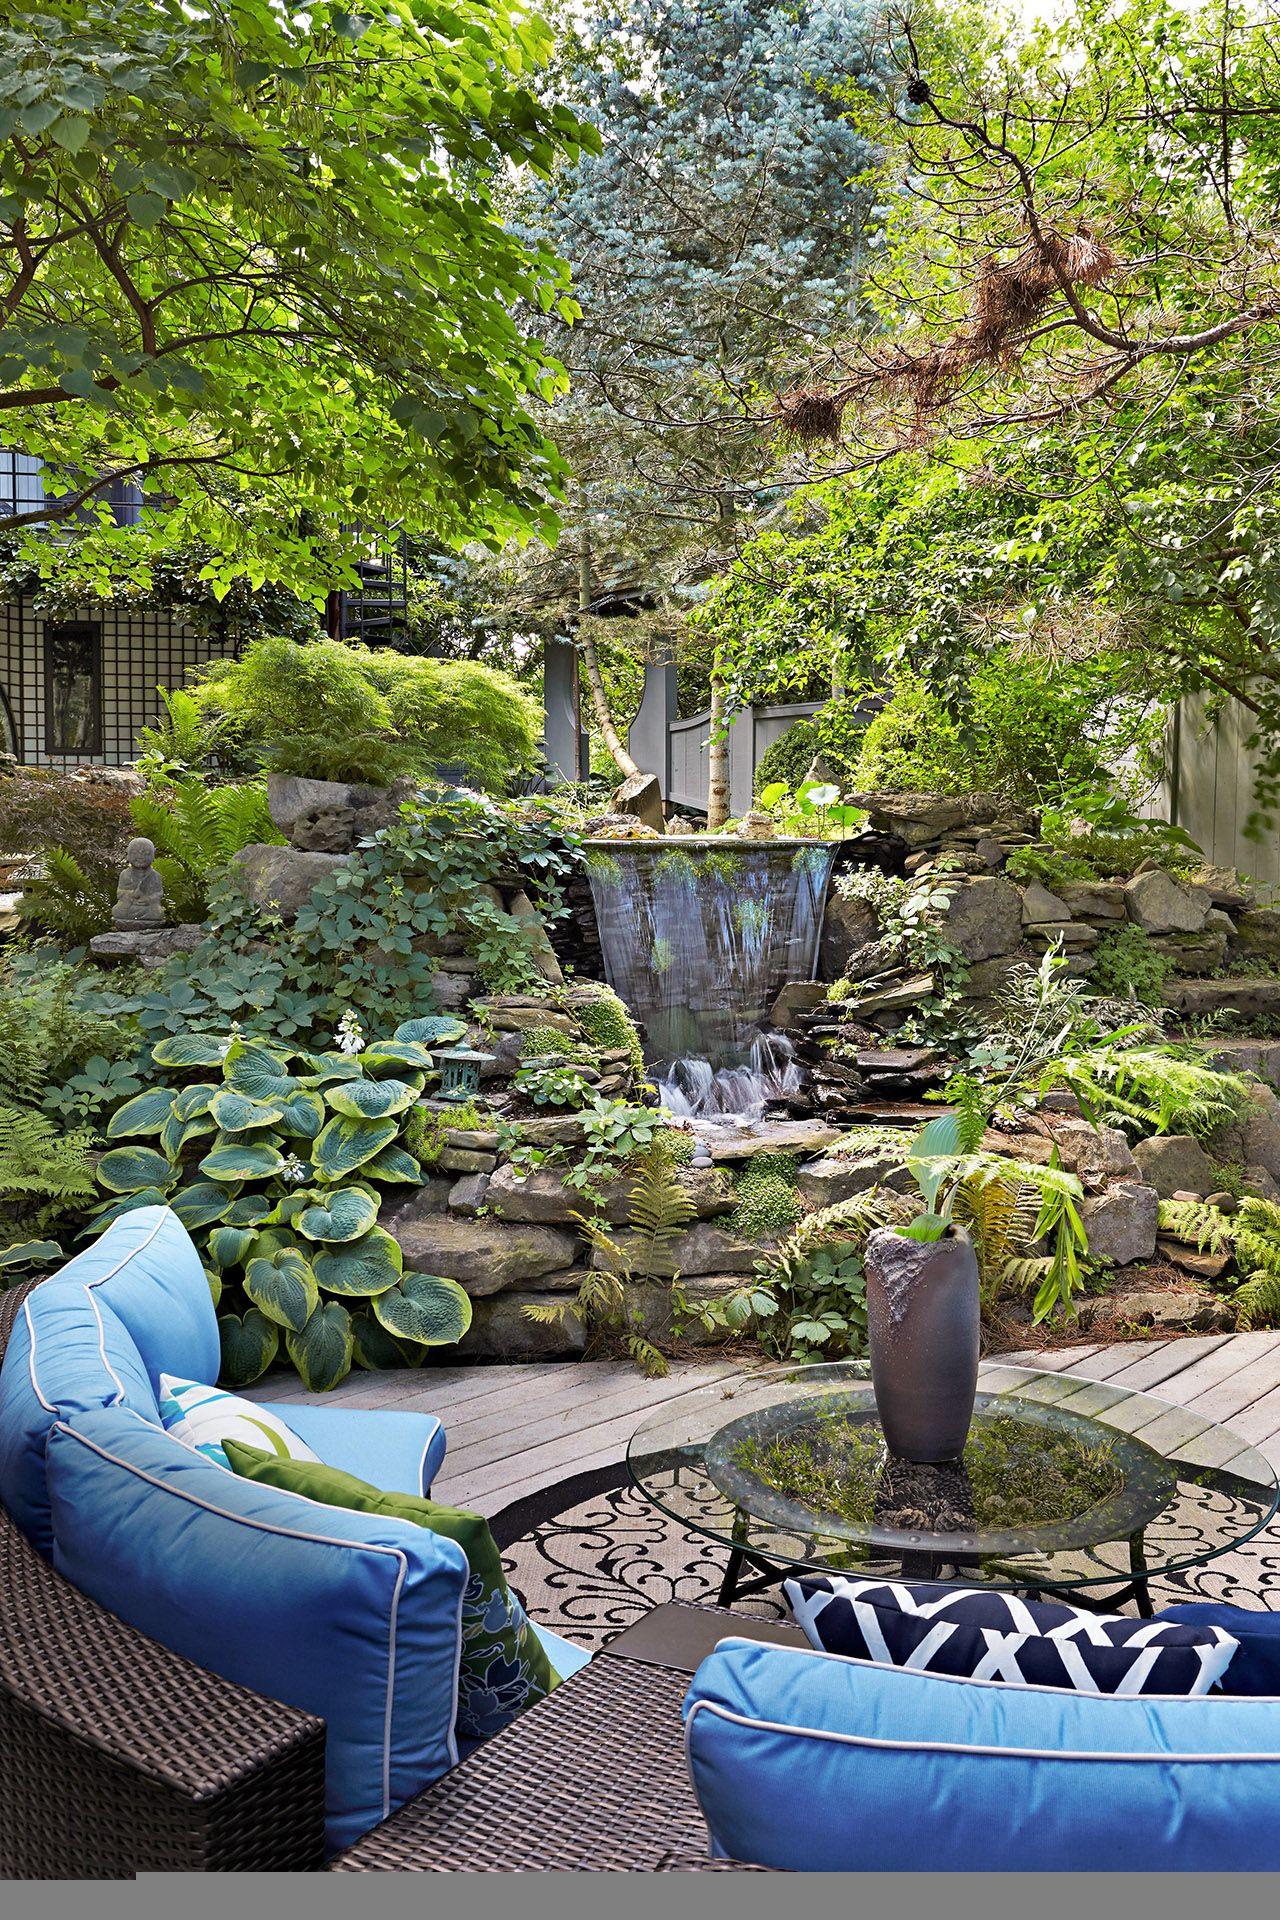 ffa05901e0c4dac974290a2617a545b9 - Better Homes And Gardens Design Ideas